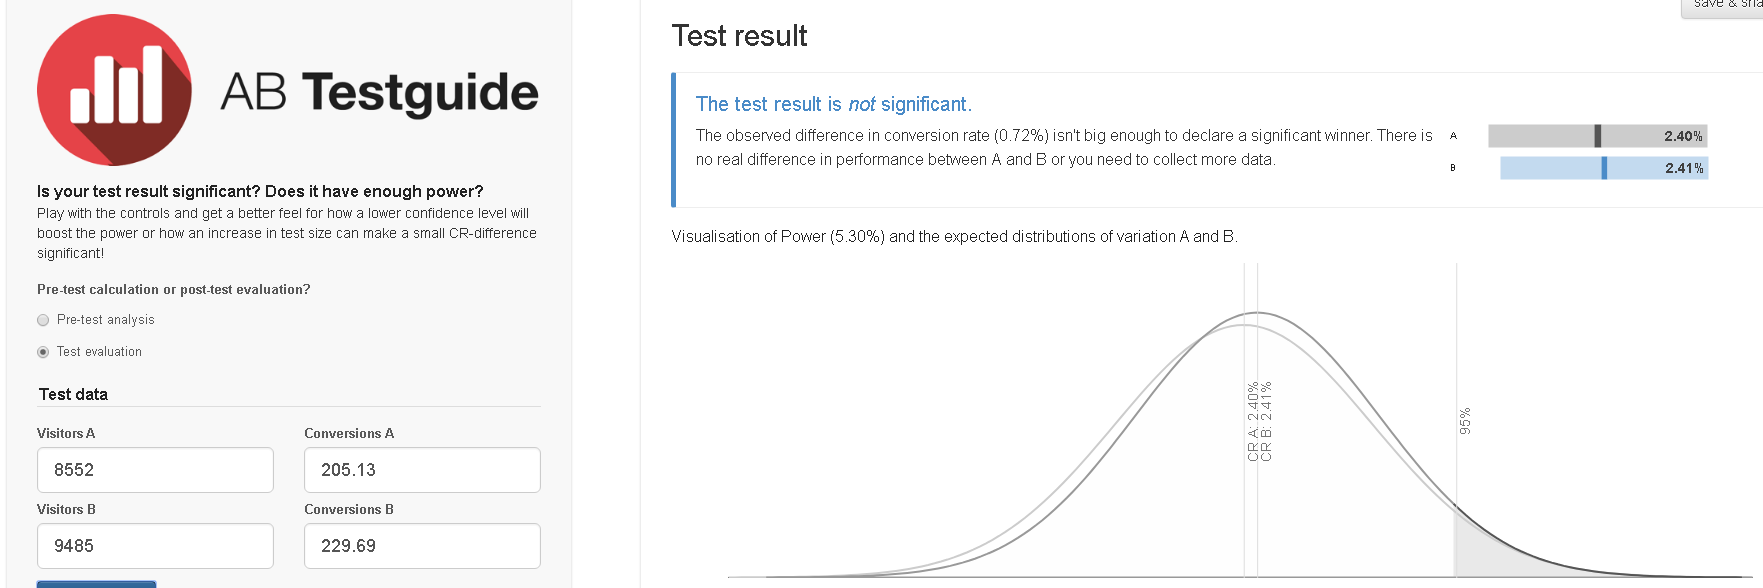 comparing twitter app posting analysis